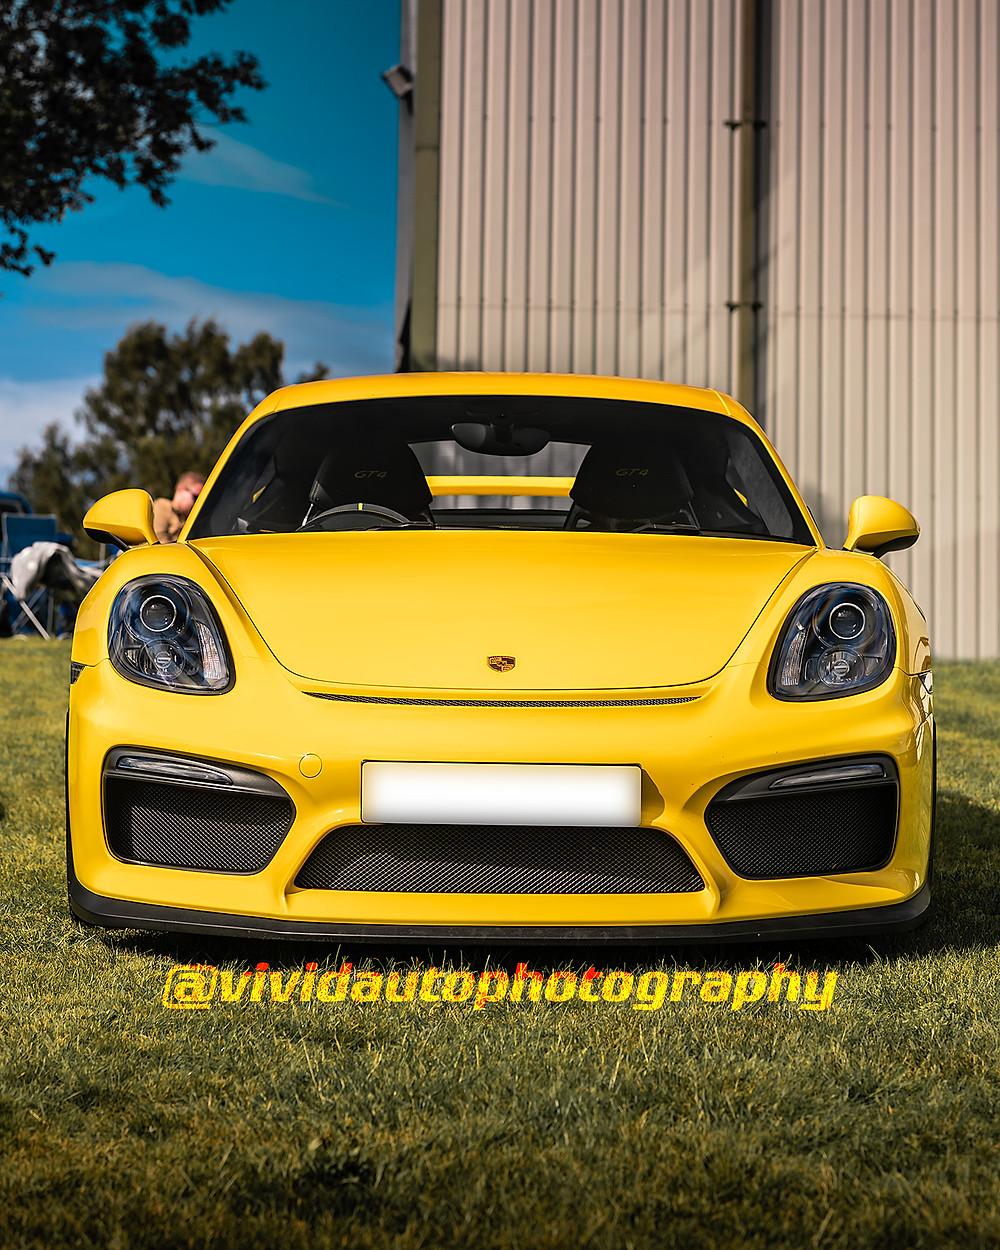 Porsche Cayman GT4 981 | Oulton Park | Racing Yellow